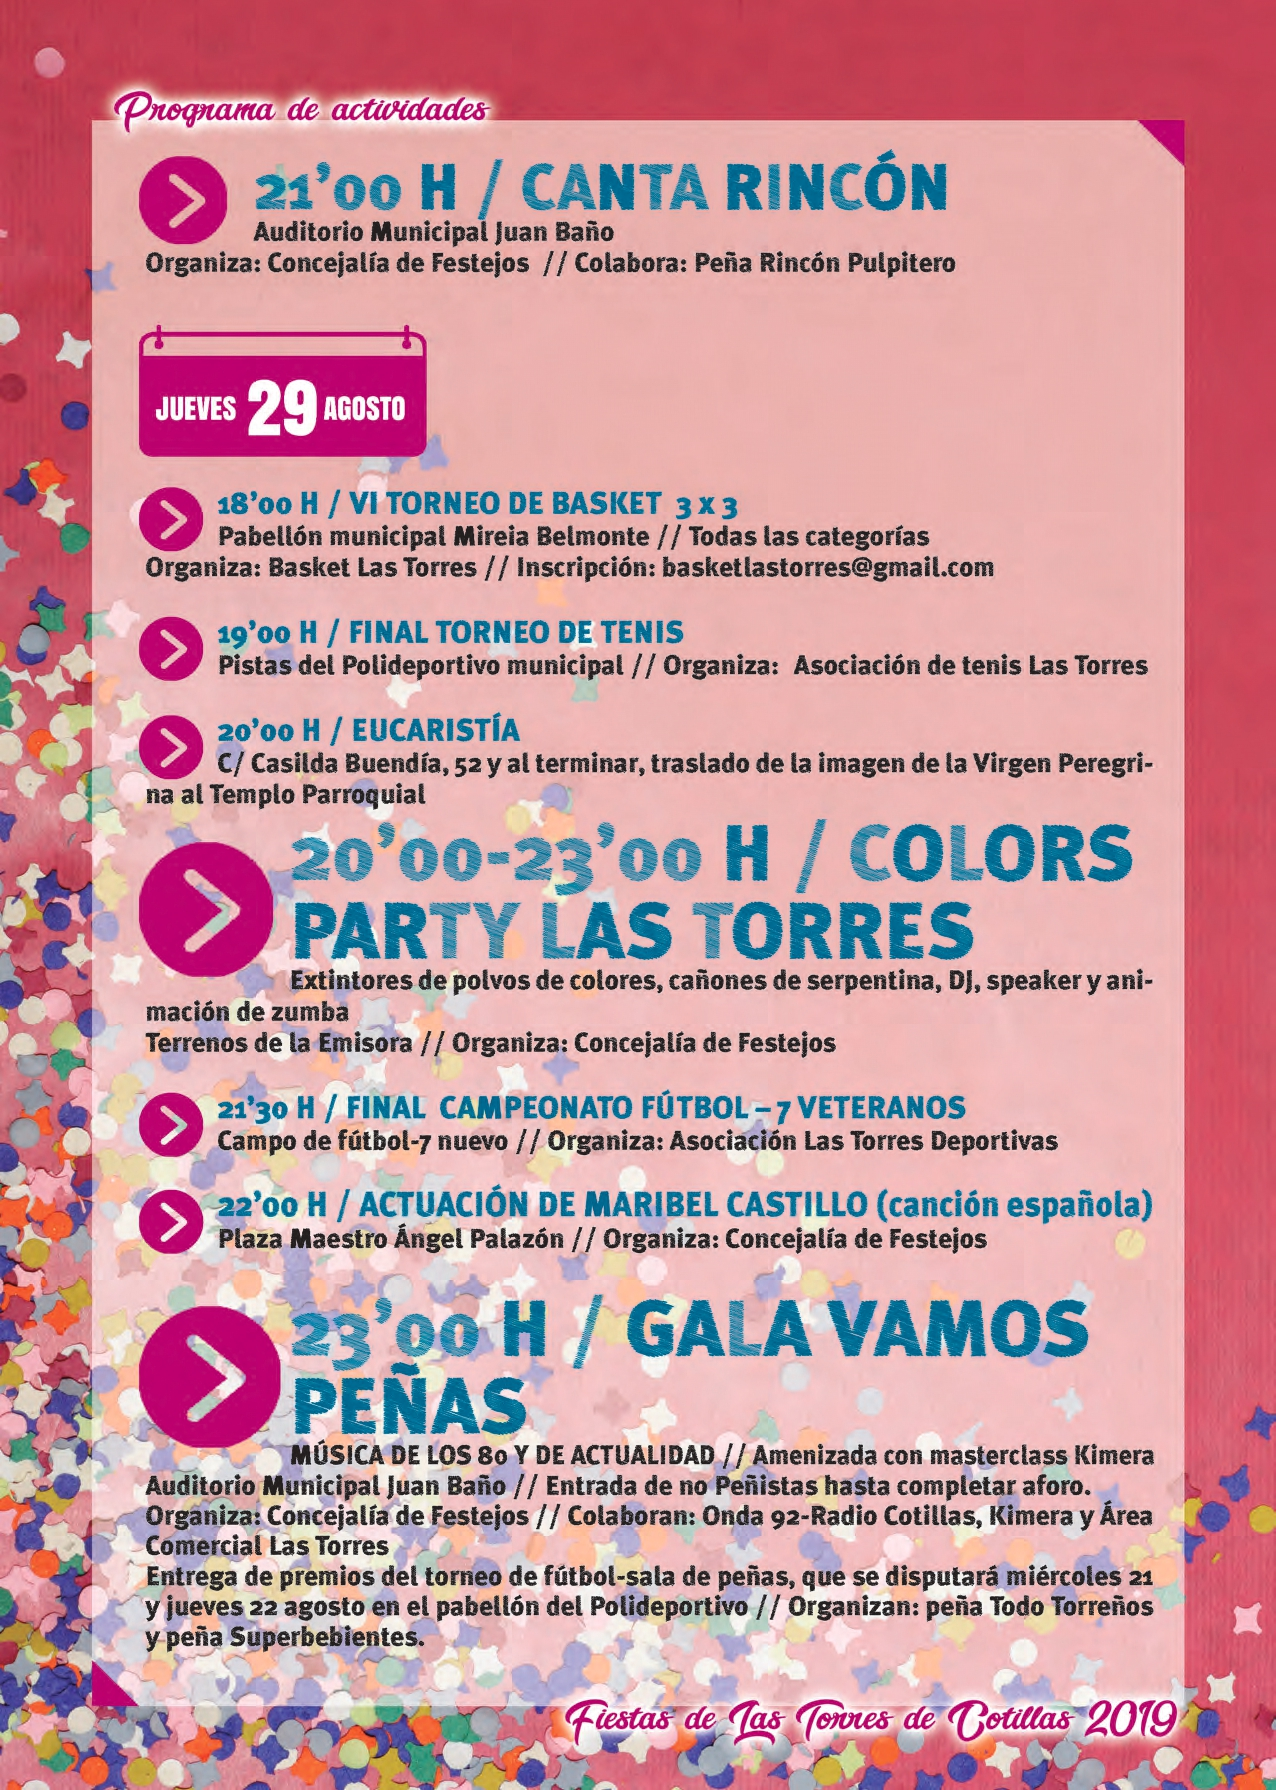 Libro-fiestas-LTC-2019_baja_page-0027.jpg